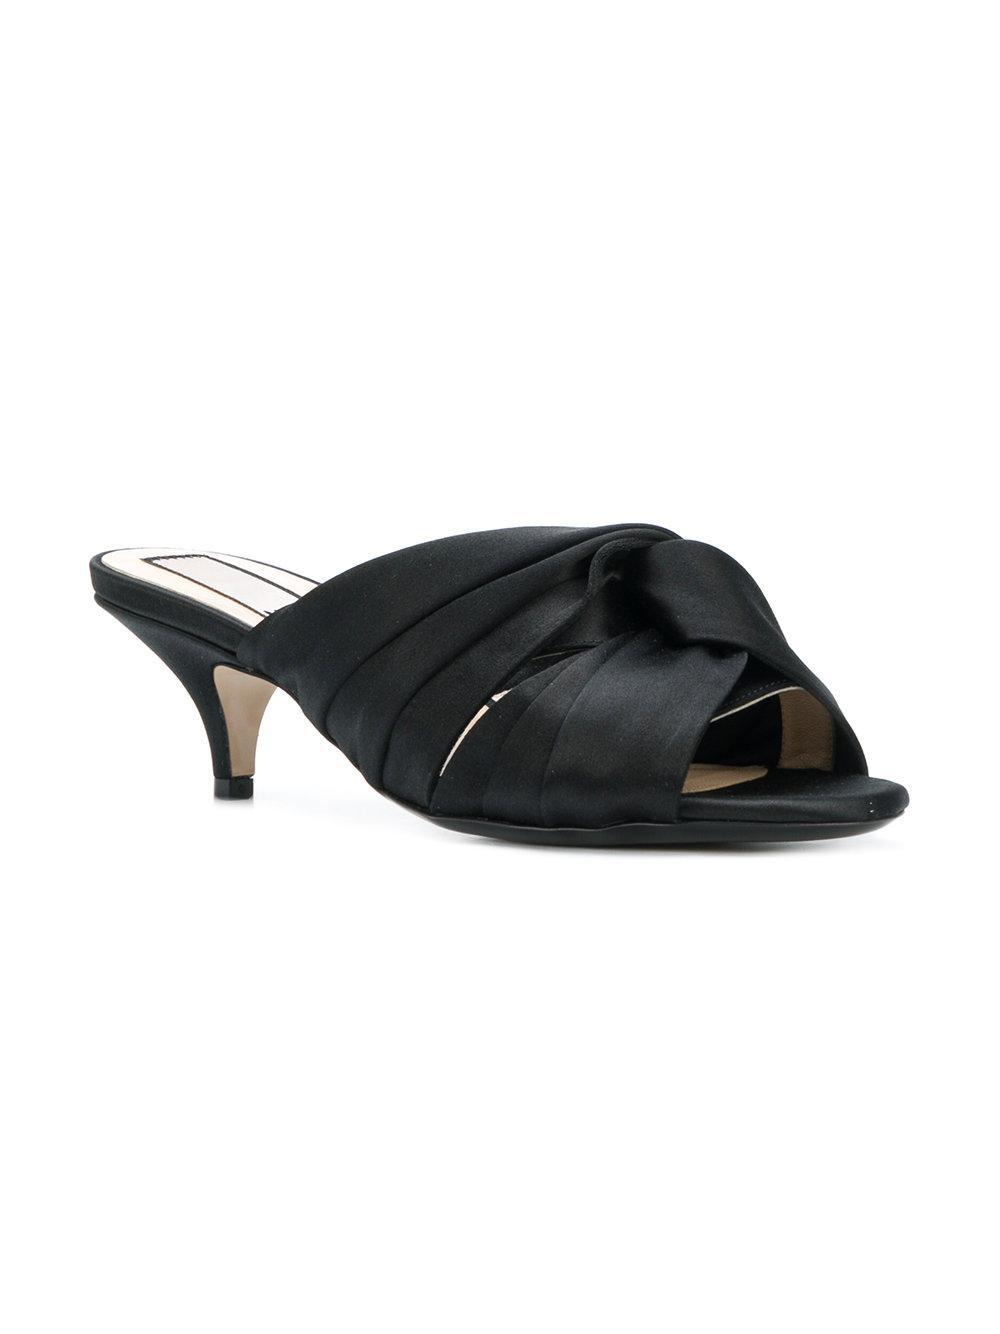 knot front kitten heel slippers - Black N UpCFsNcTyt